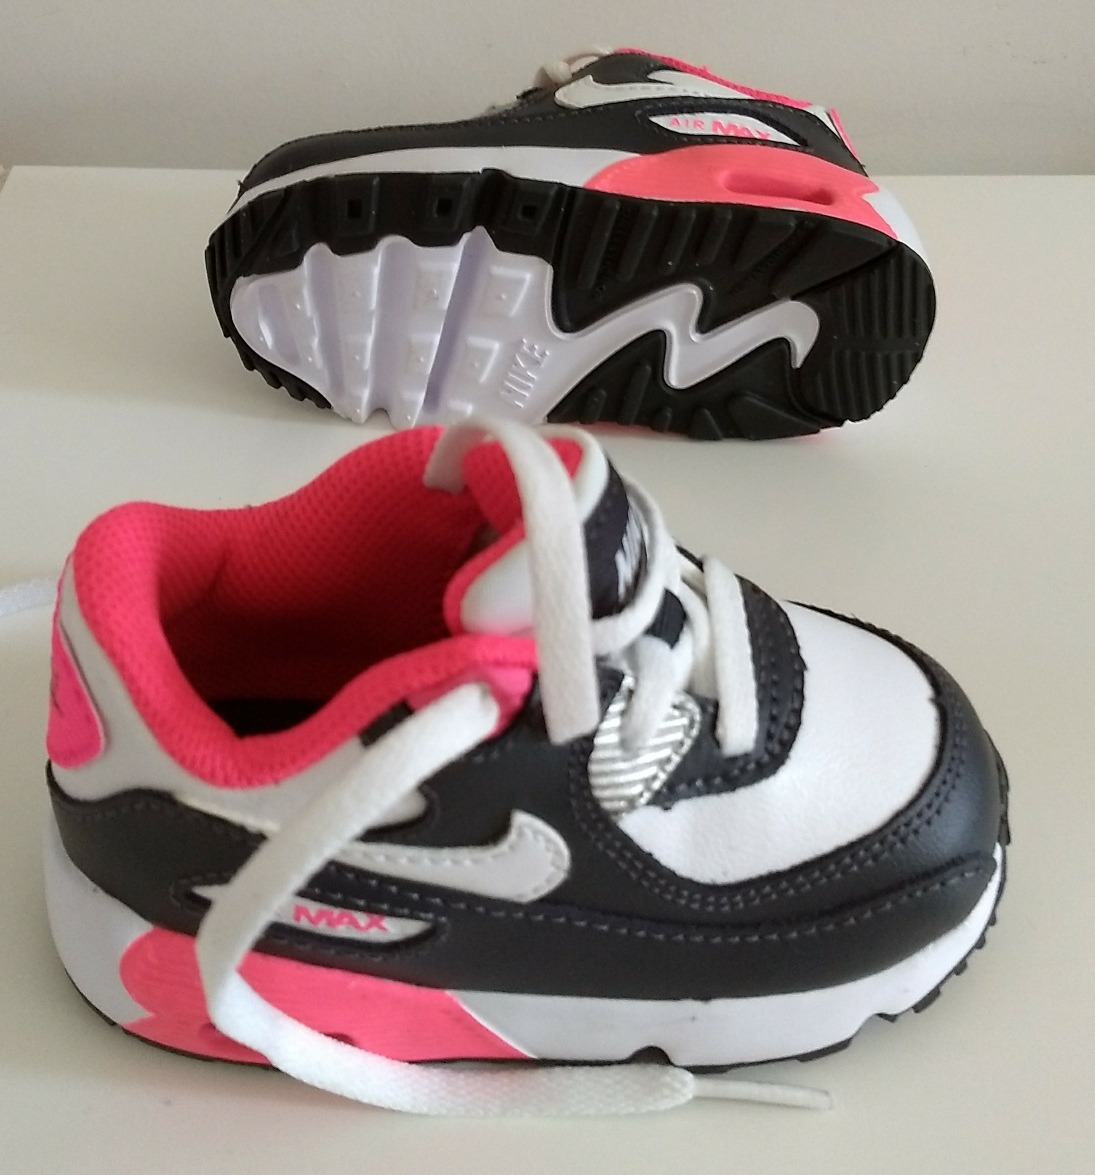 6952056949ccd zapatillas nike air max bebes niños okm usa 5c 11 cm. Cargando zoom.